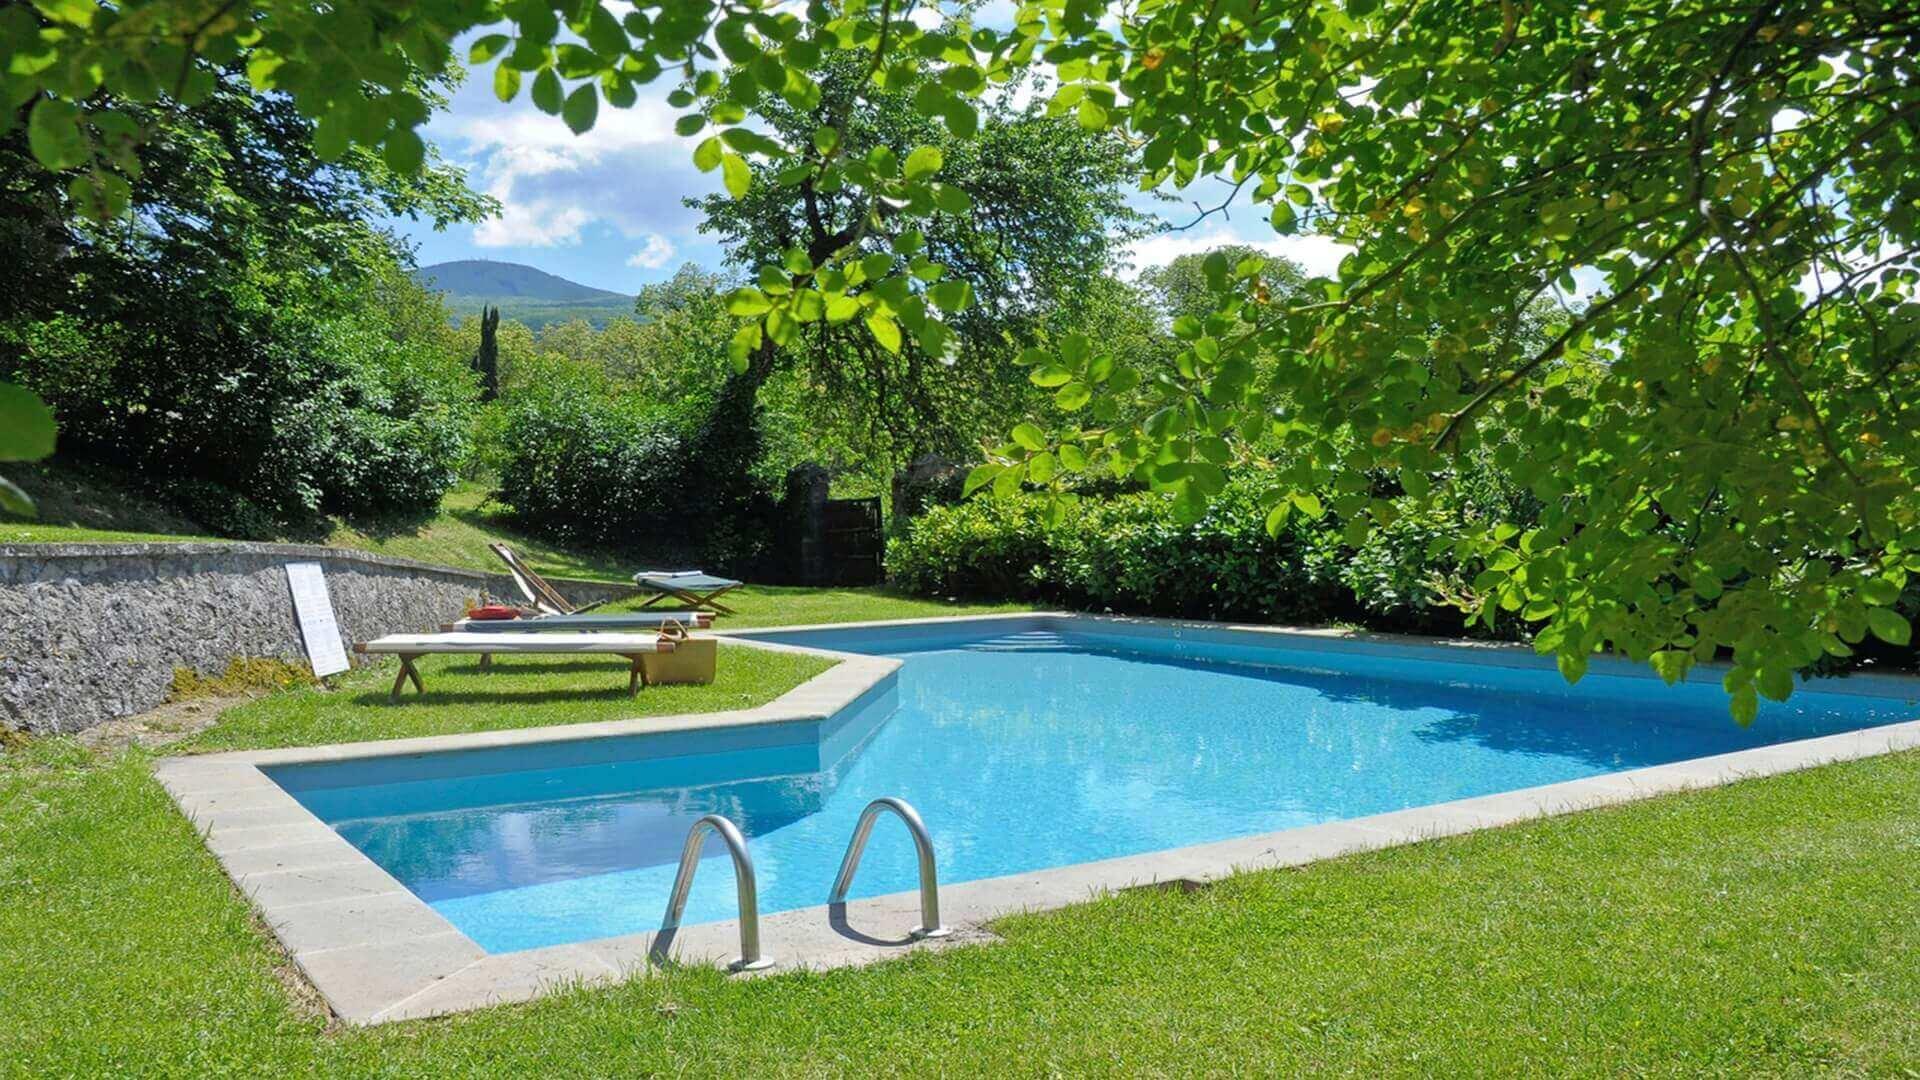 Casa dell'Ambasciatore Vivo d'Orcia Val d'Orcia Tuscany